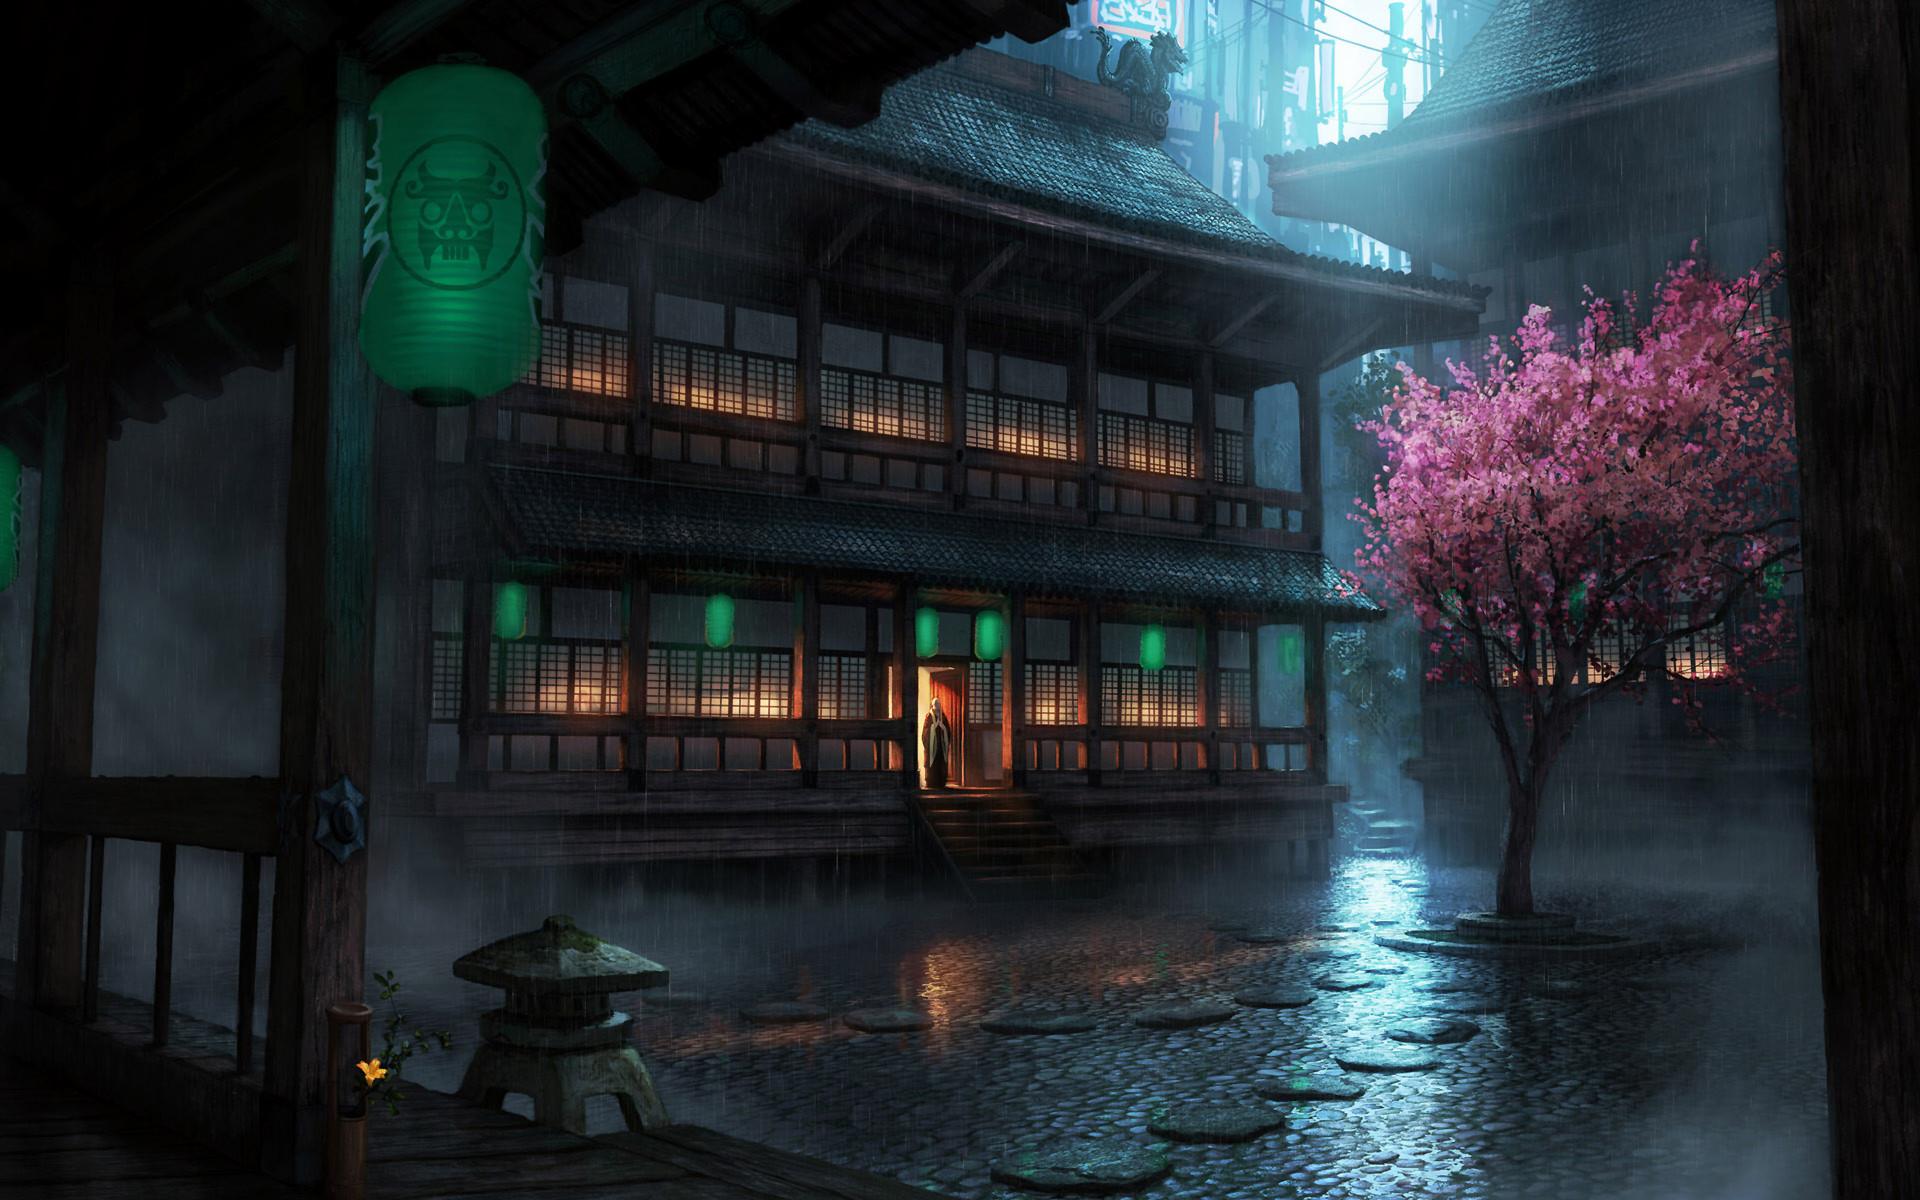 City Japan Beautifull Backgrounds – https://wallawy.com/city-japan